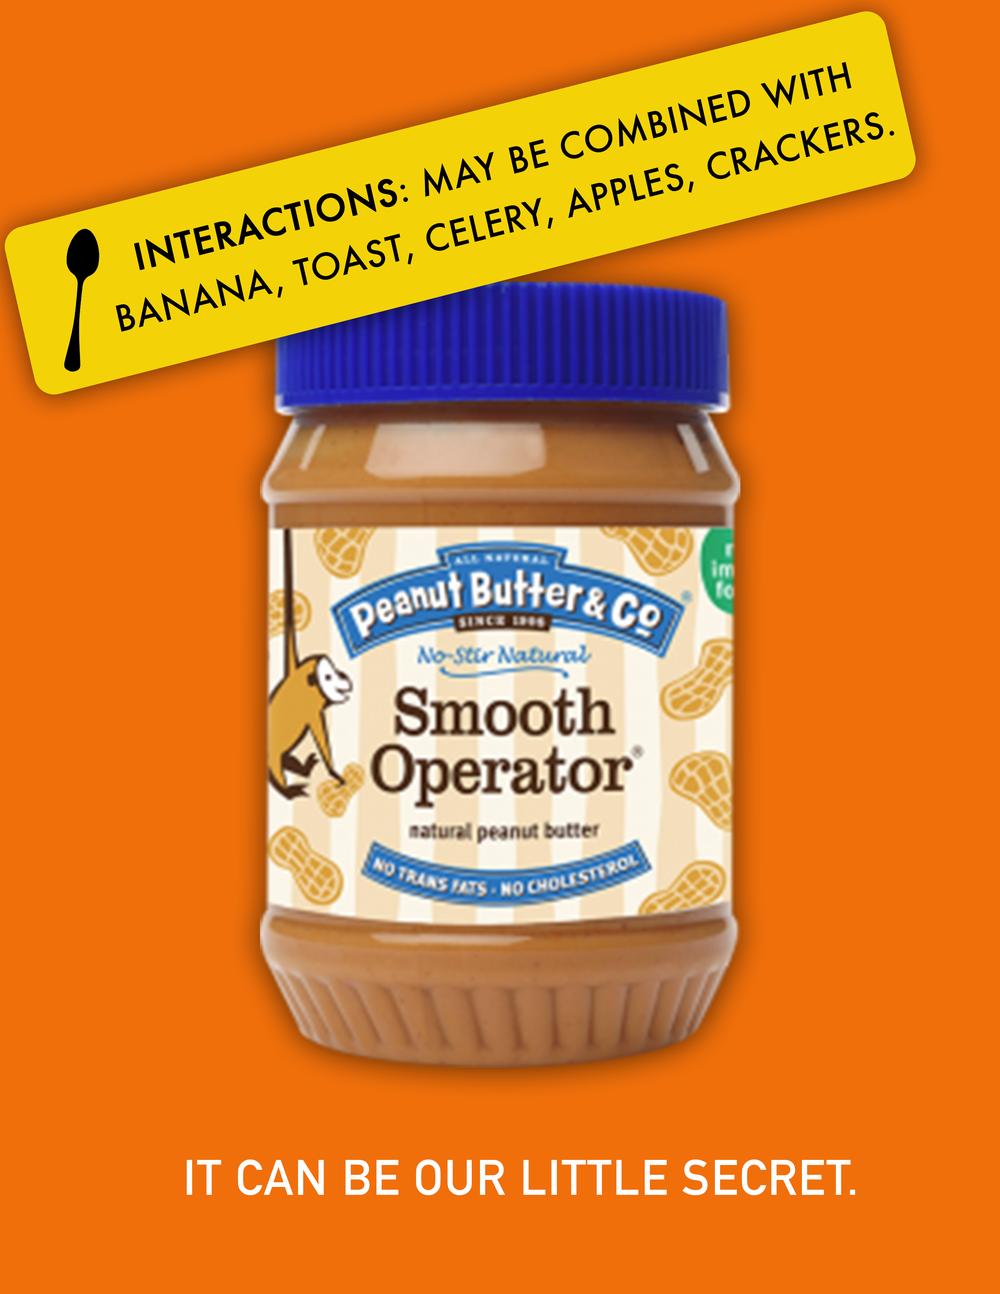 Peanut Butter & Co.